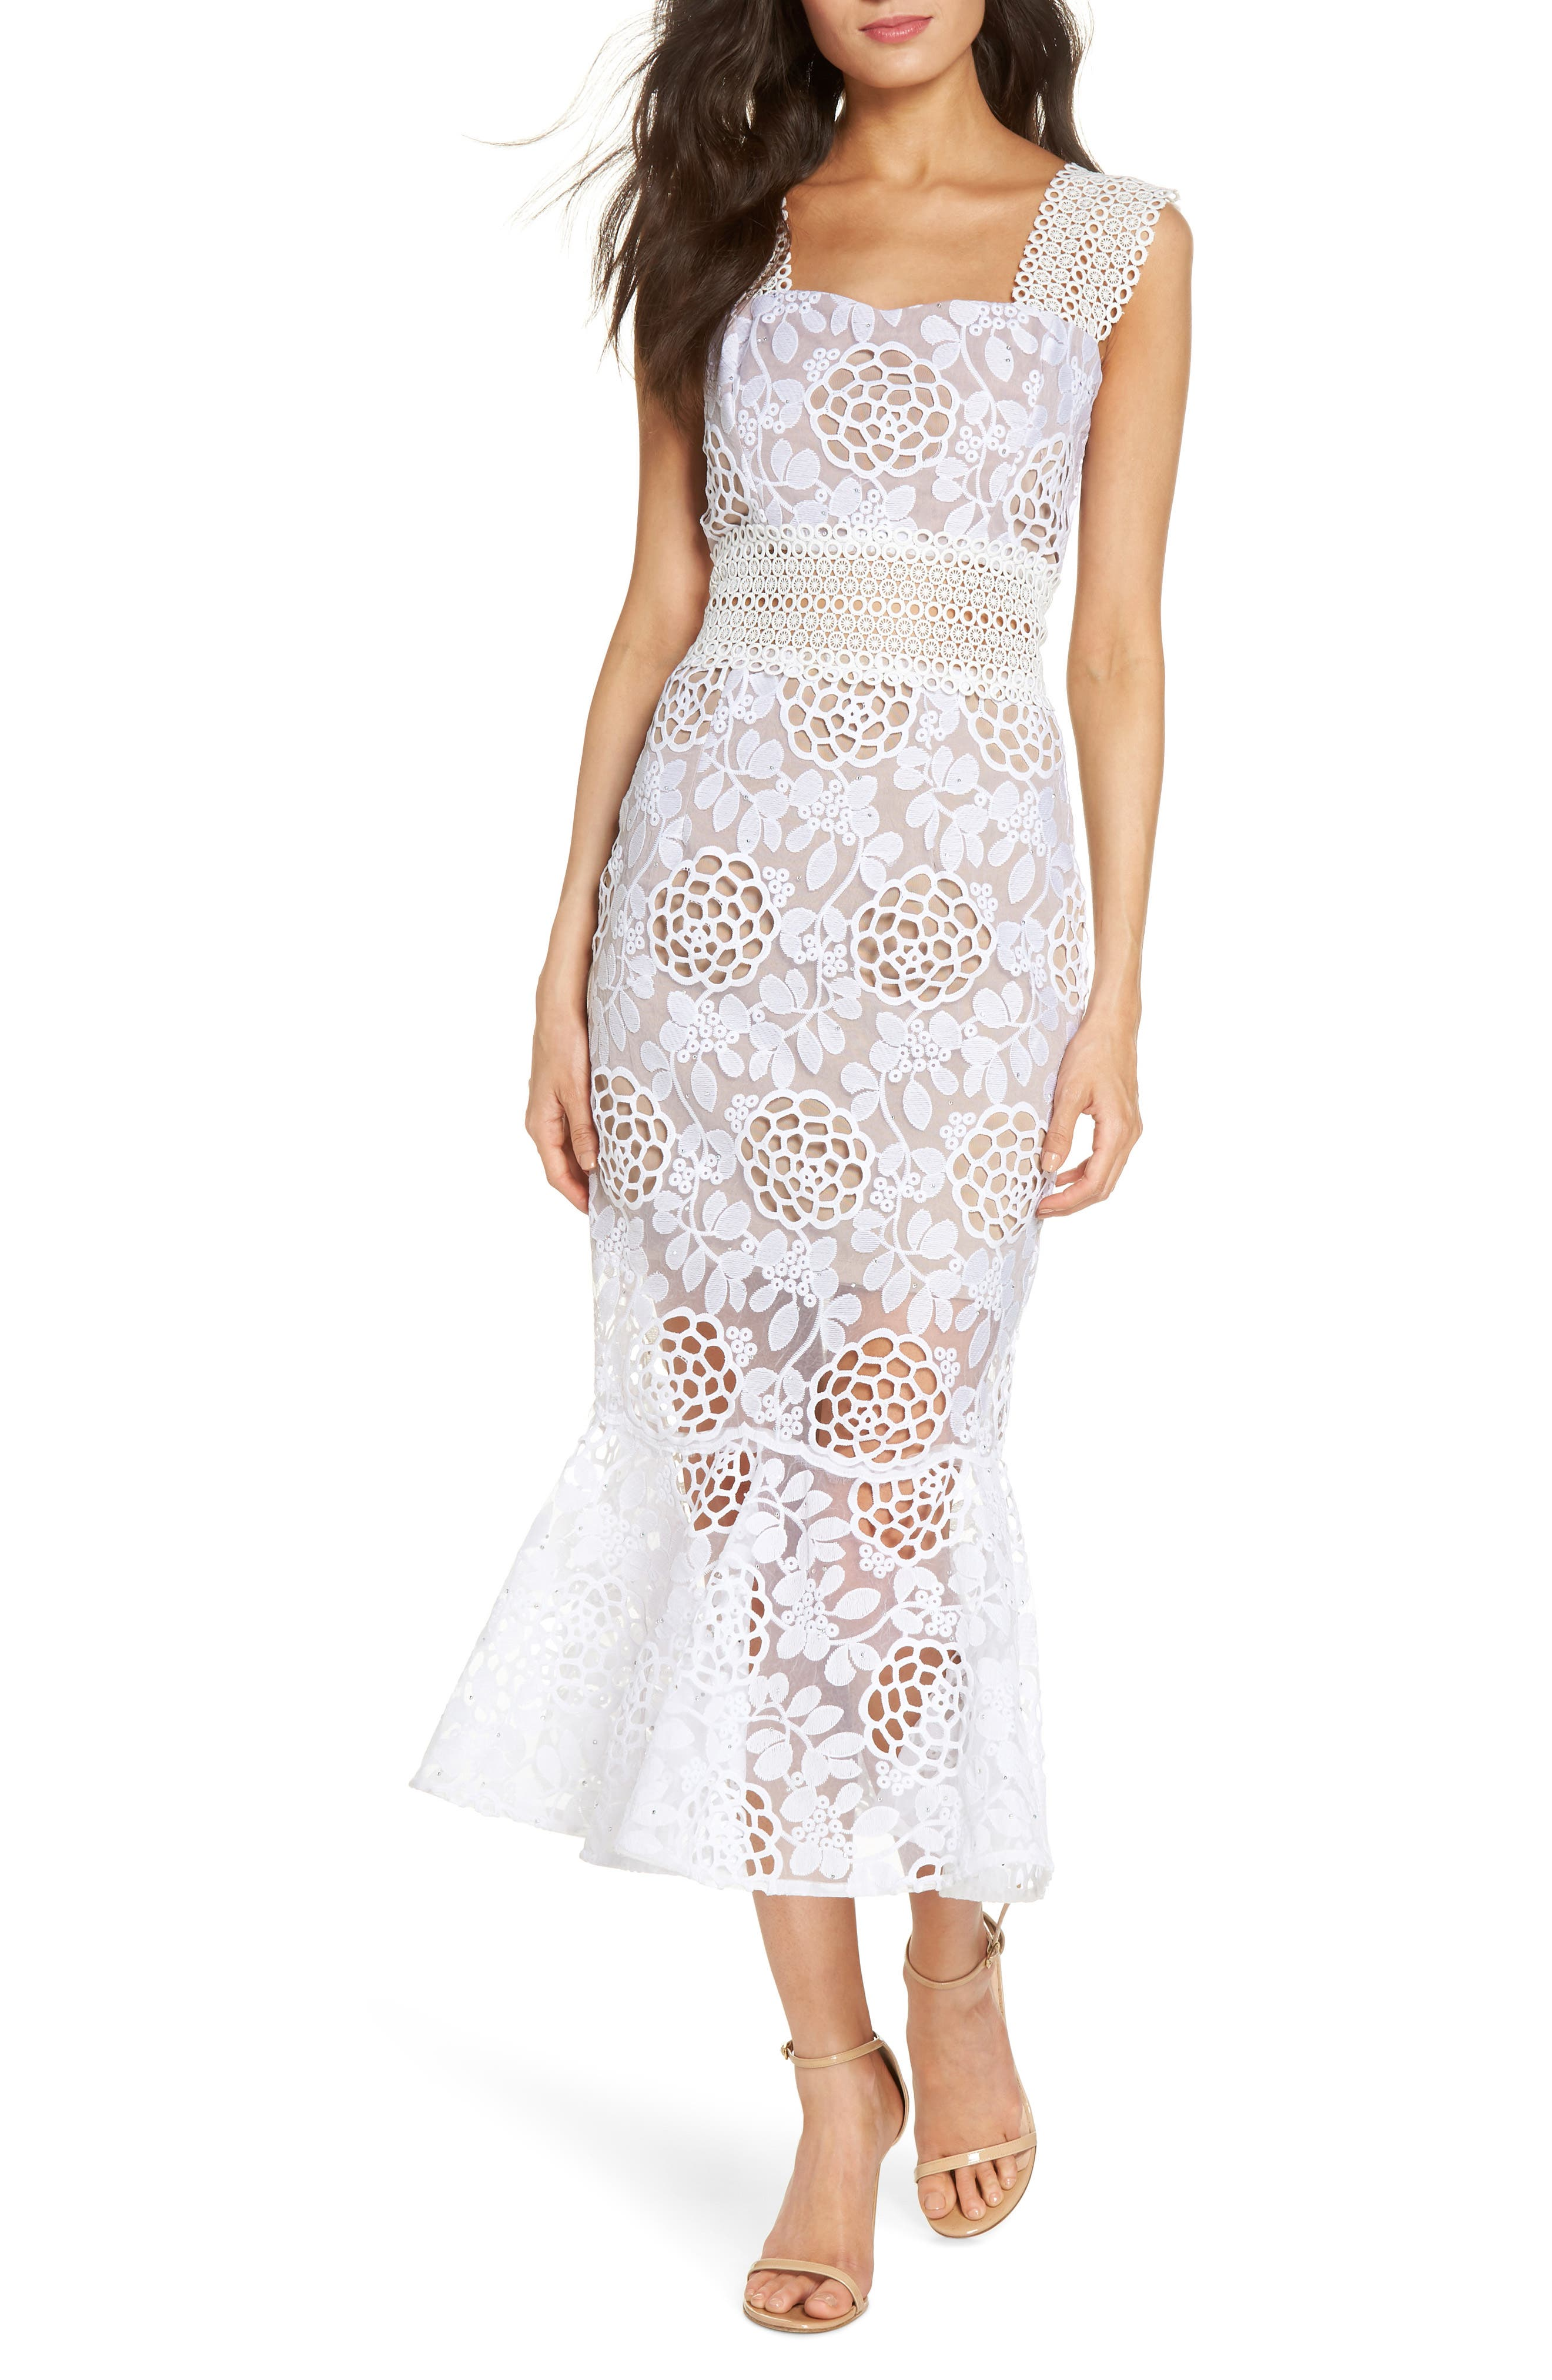 BRONX AND BANCO,                             Capri Floral Lace Midi Dress,                             Main thumbnail 1, color,                             100